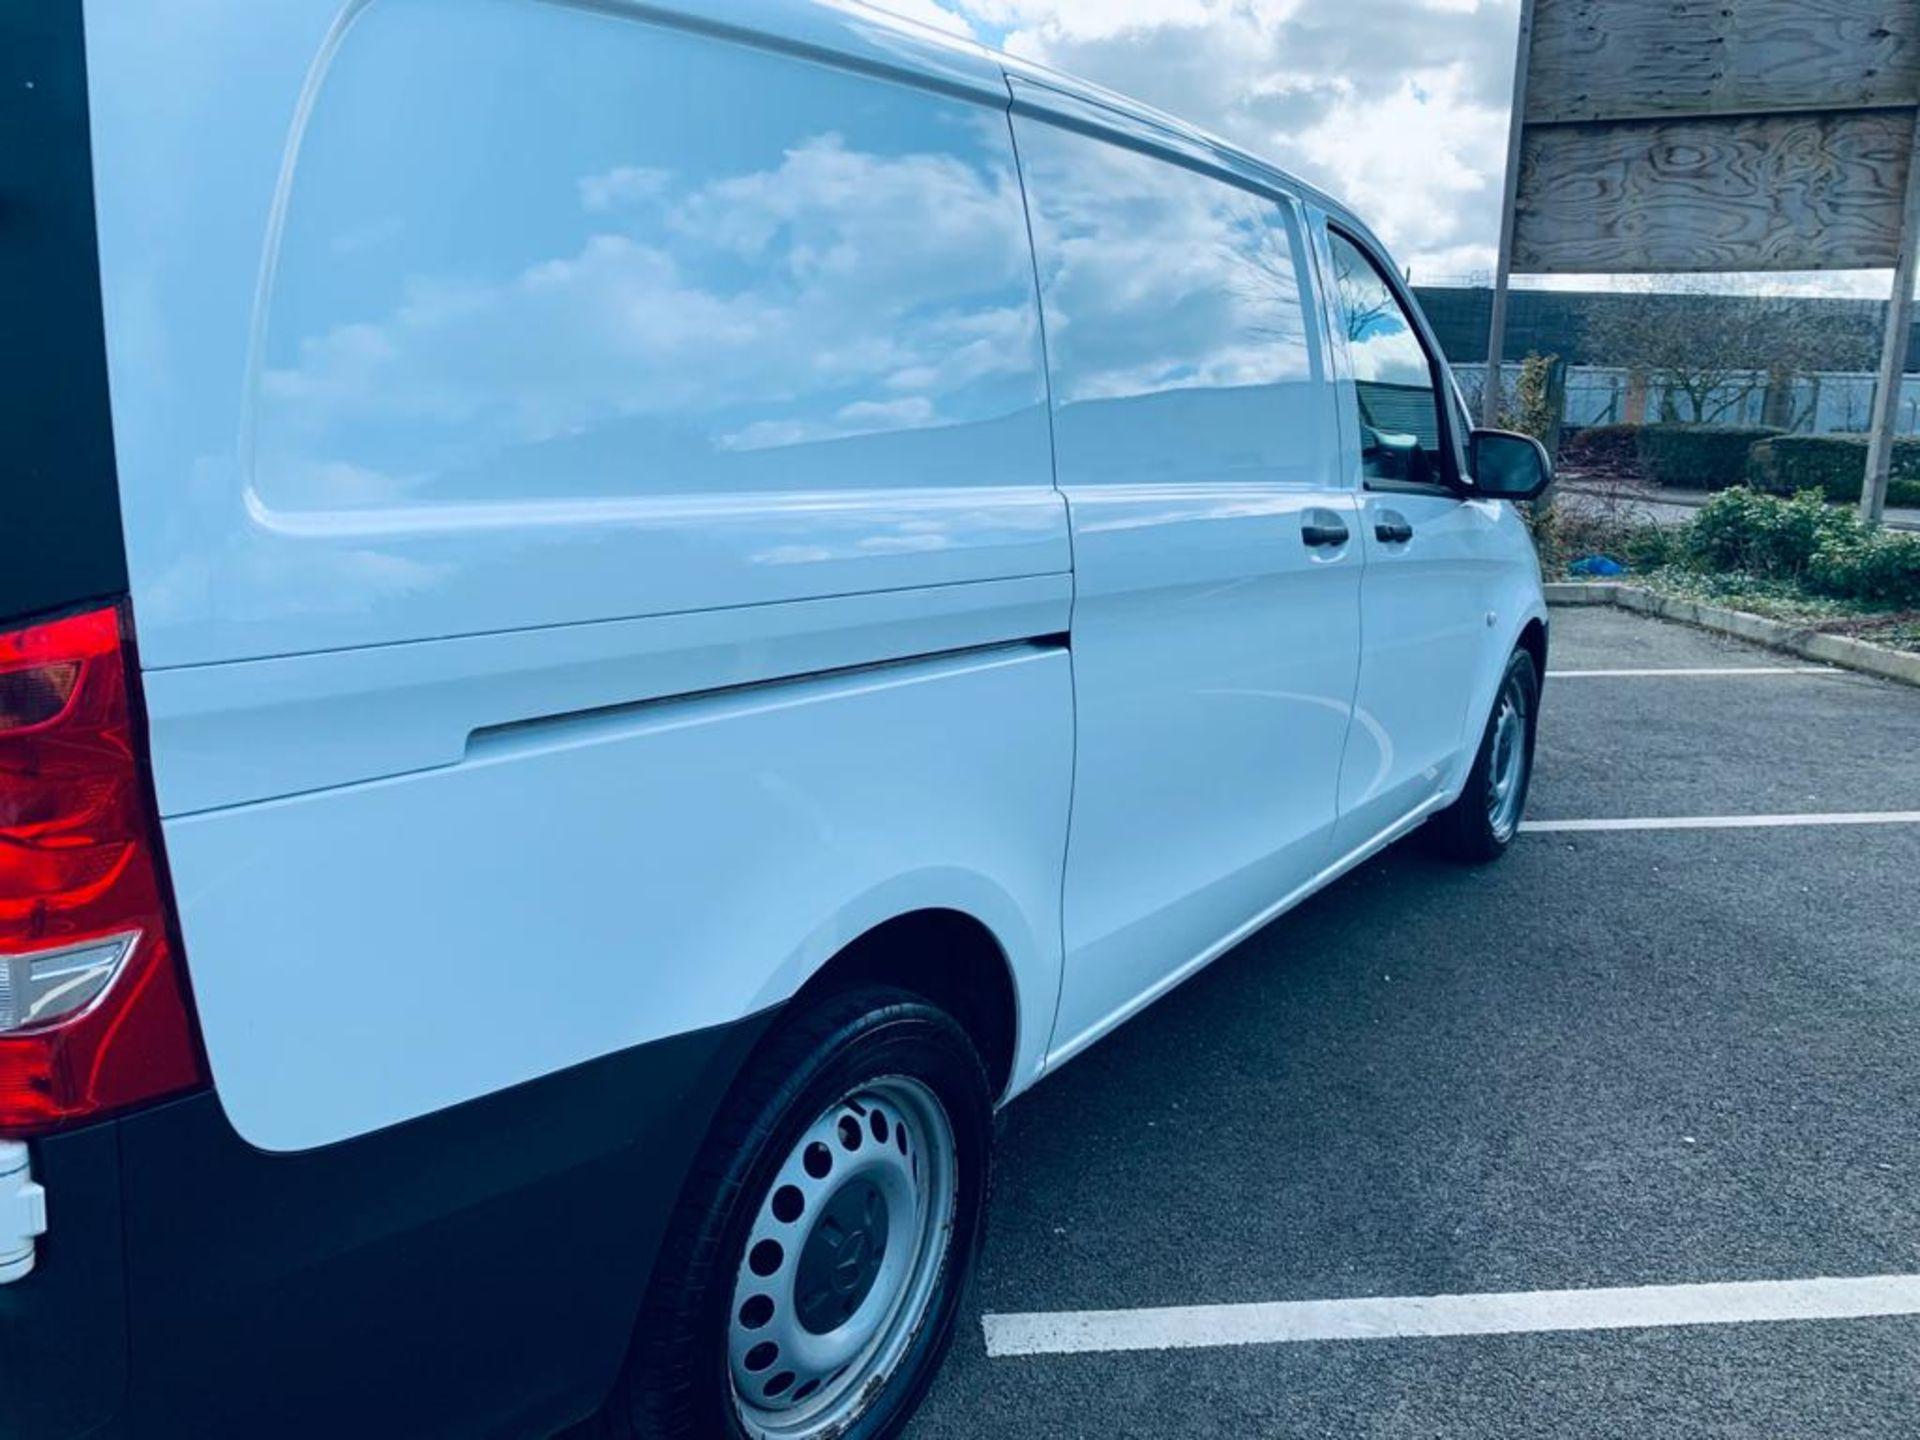 Reserve Met - Mercedes Vito 114CDI Bluetec 2018 18 Reg LWB - Air Con - Euro 6 - FSH - ULEZ - 1 Owner - Image 3 of 26